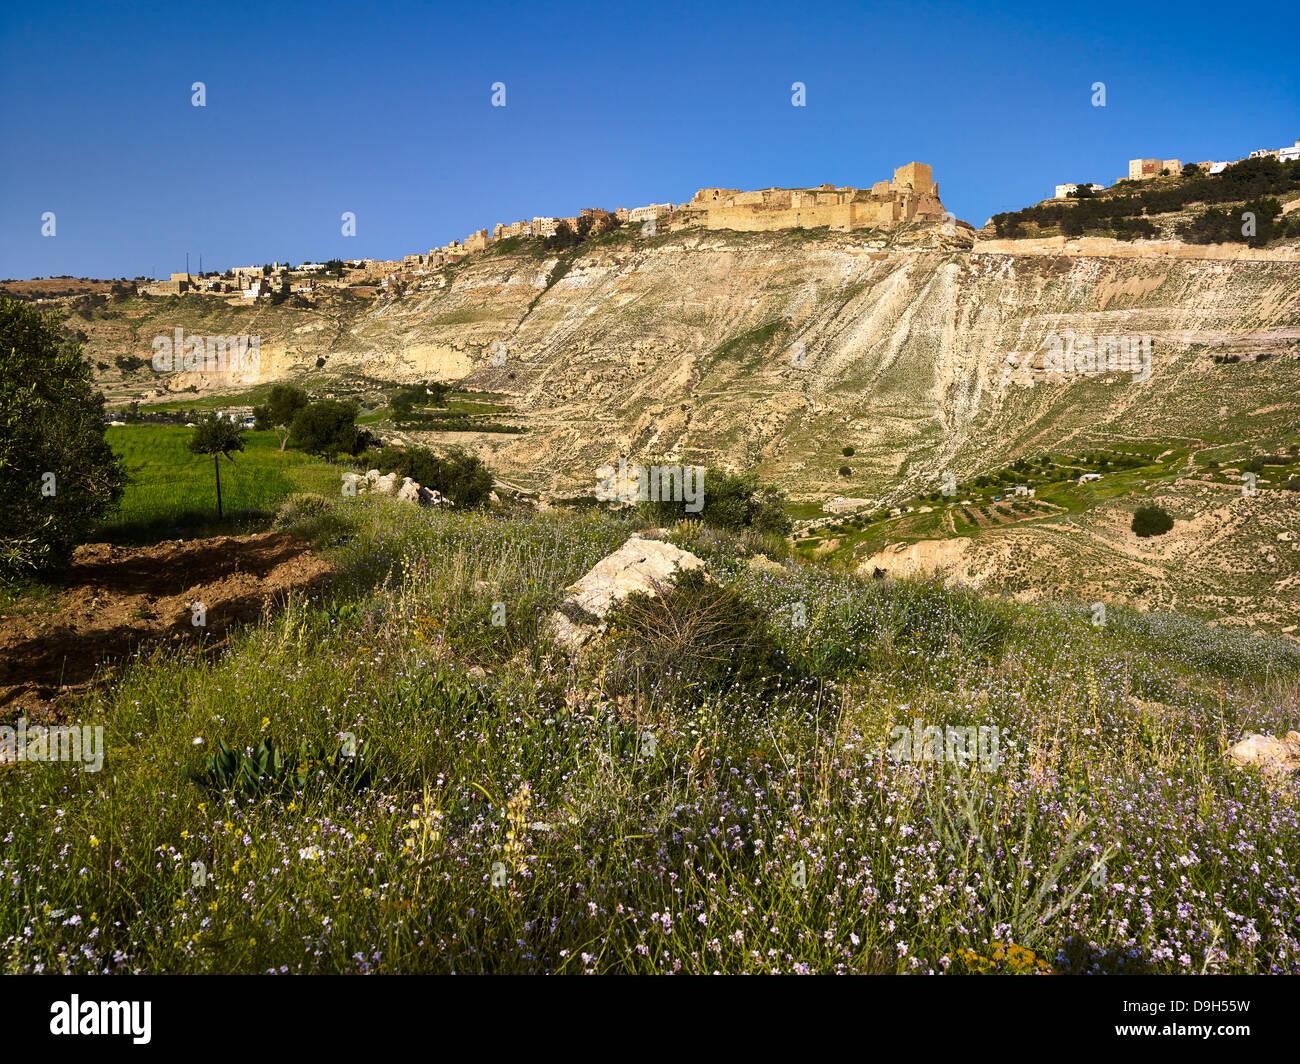 Crusaders Castle Karak, Jordan, Middle East Stock Photo